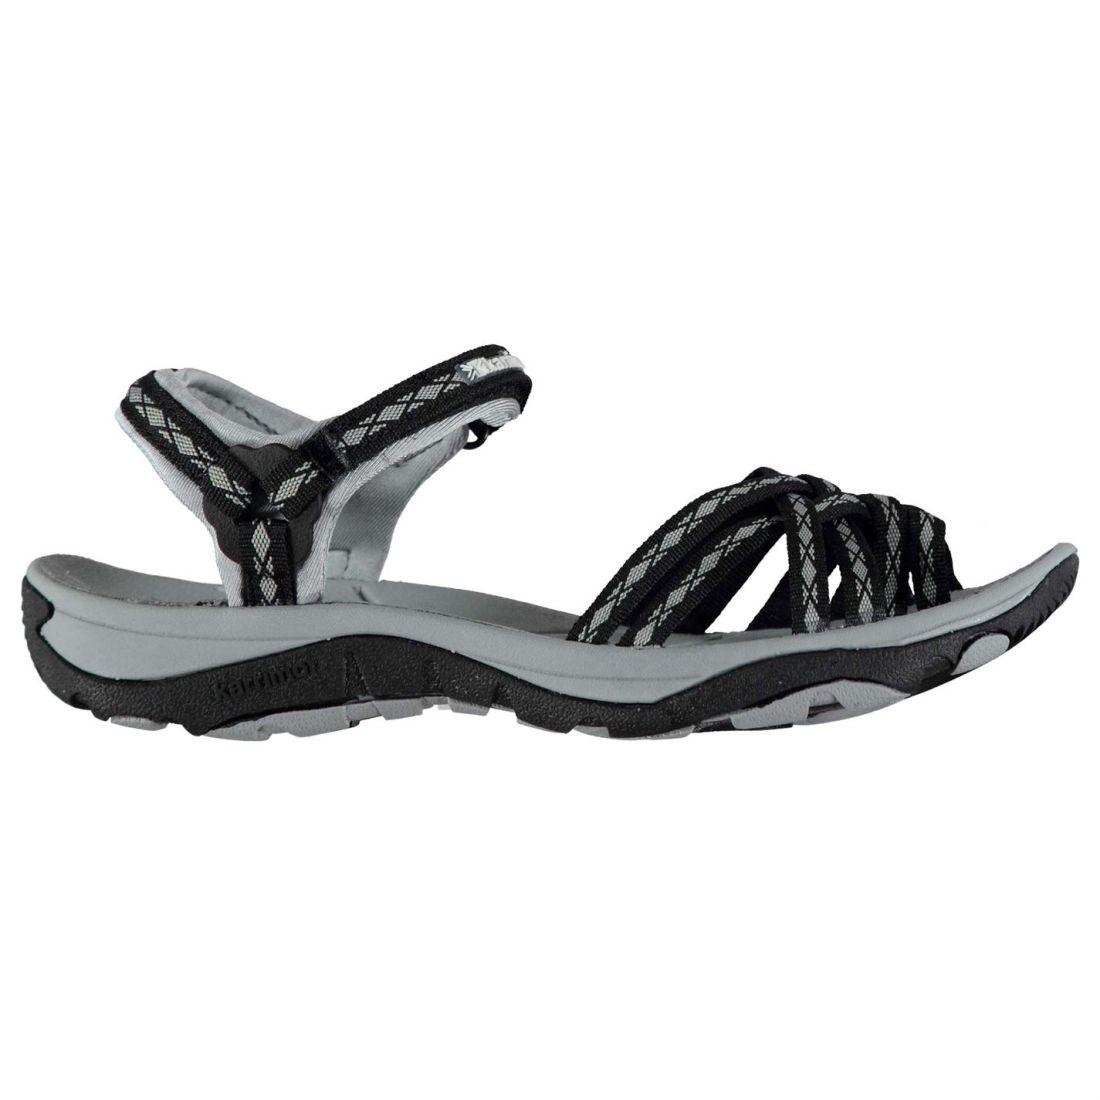 Image is loading Karrimor-Womens-Ladies-Salina-Walking-Sandals-Summer-Shoes- e03b581f9f